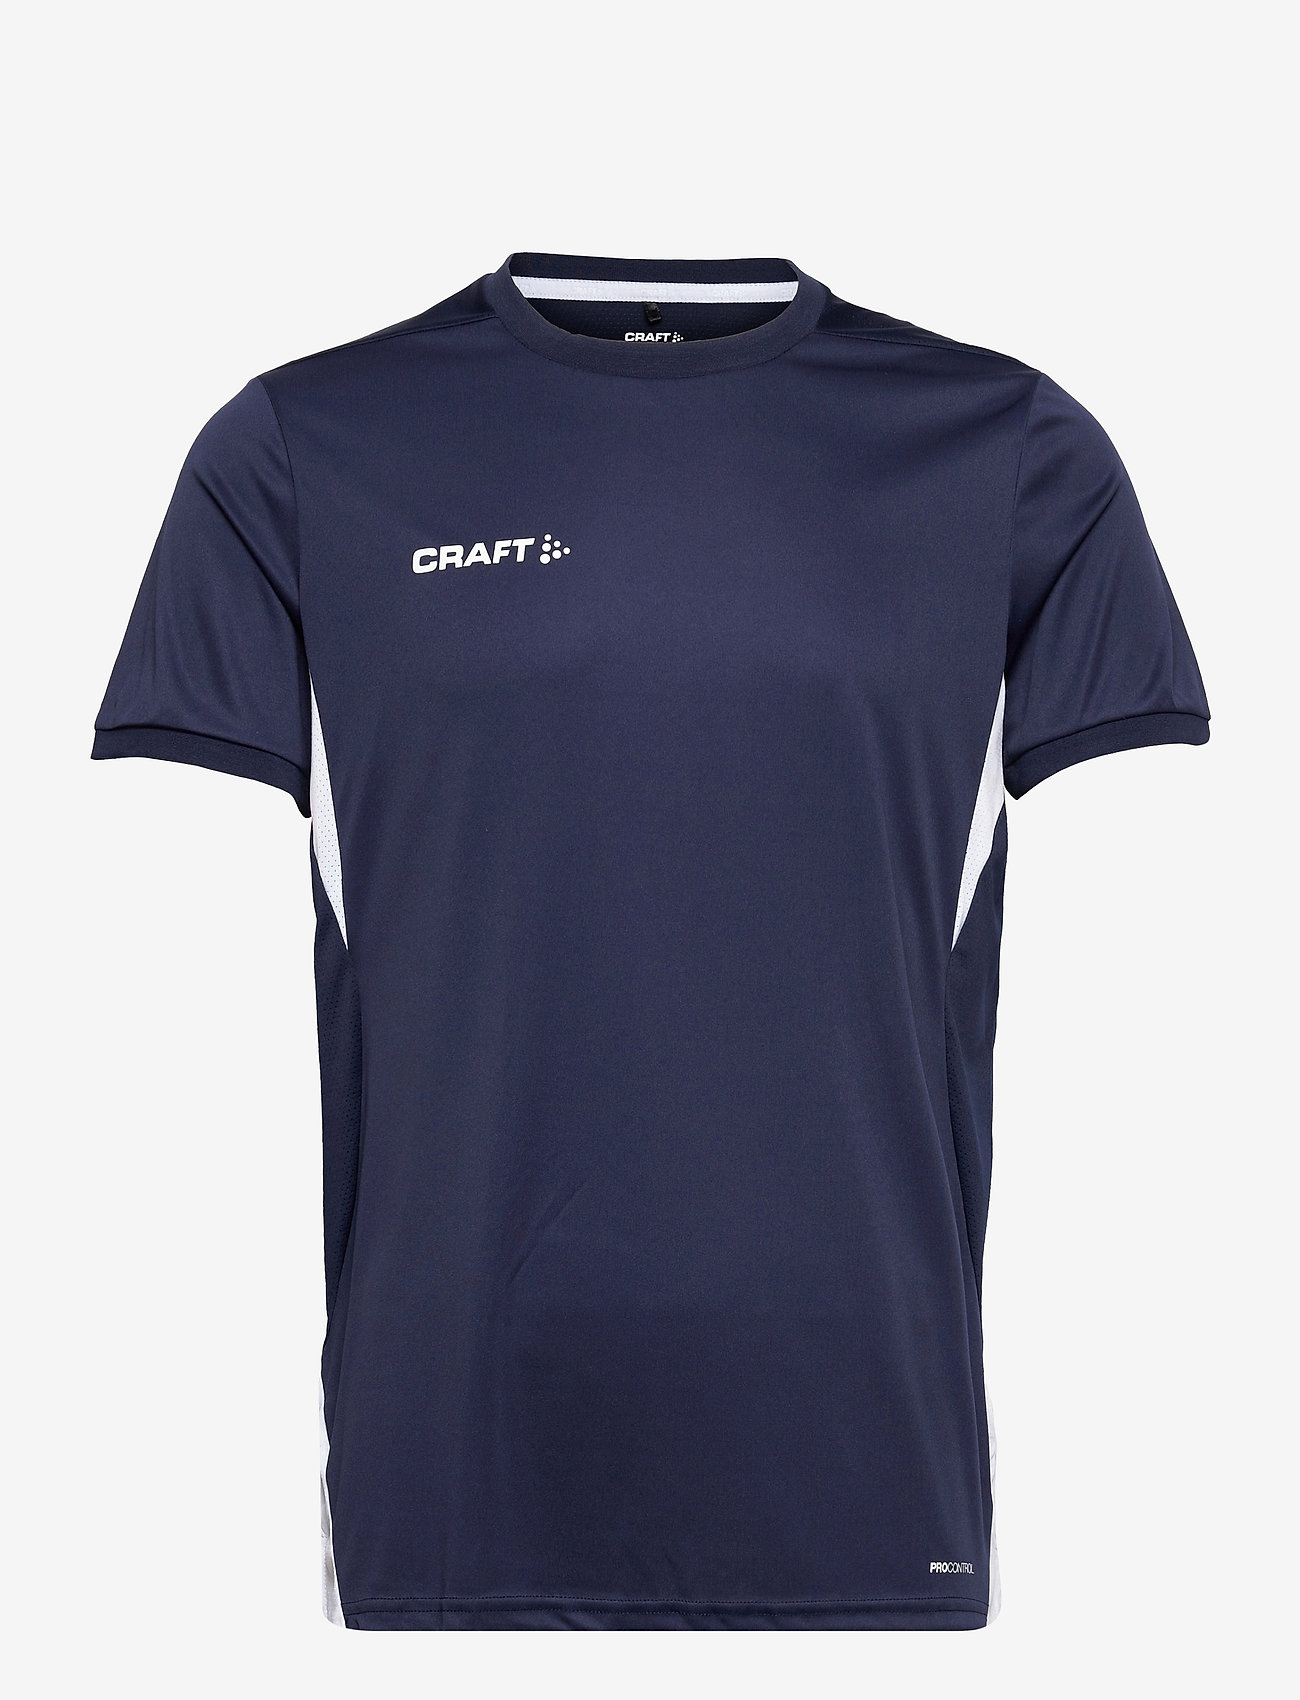 Craft - Pro Control Impact SS Tee M - t-shirts - navy/white - 0